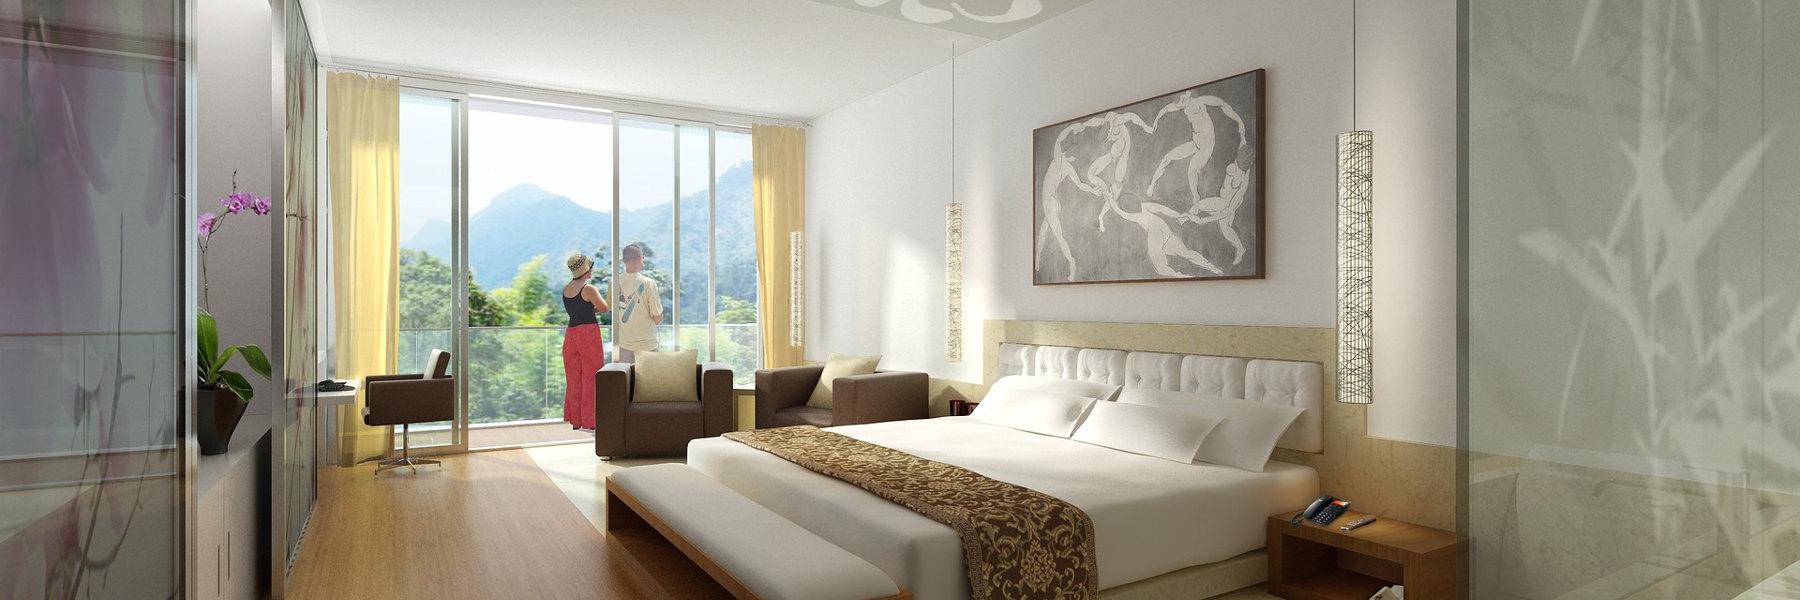 ▷▷▷ Restplätze Hotels & Appartements